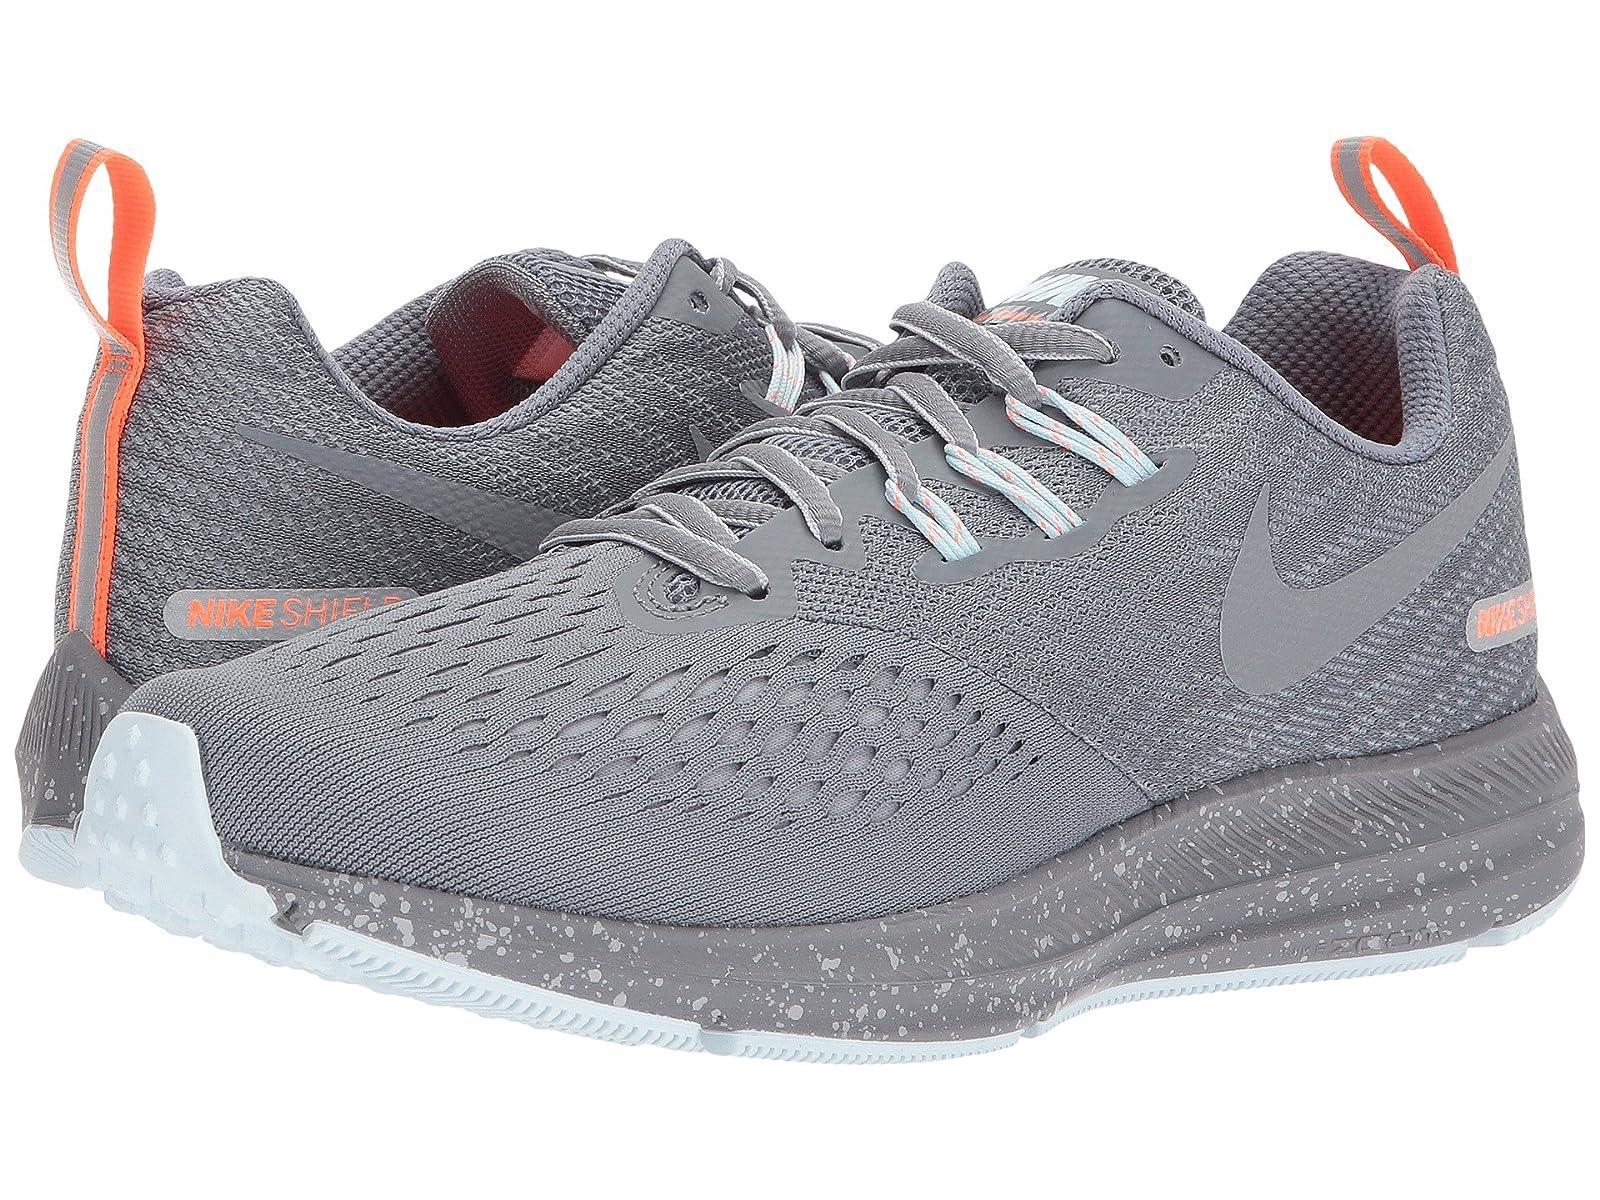 Nike Air Zoom Winflo 4 ShieldCheap and distinctive eye-catching shoes